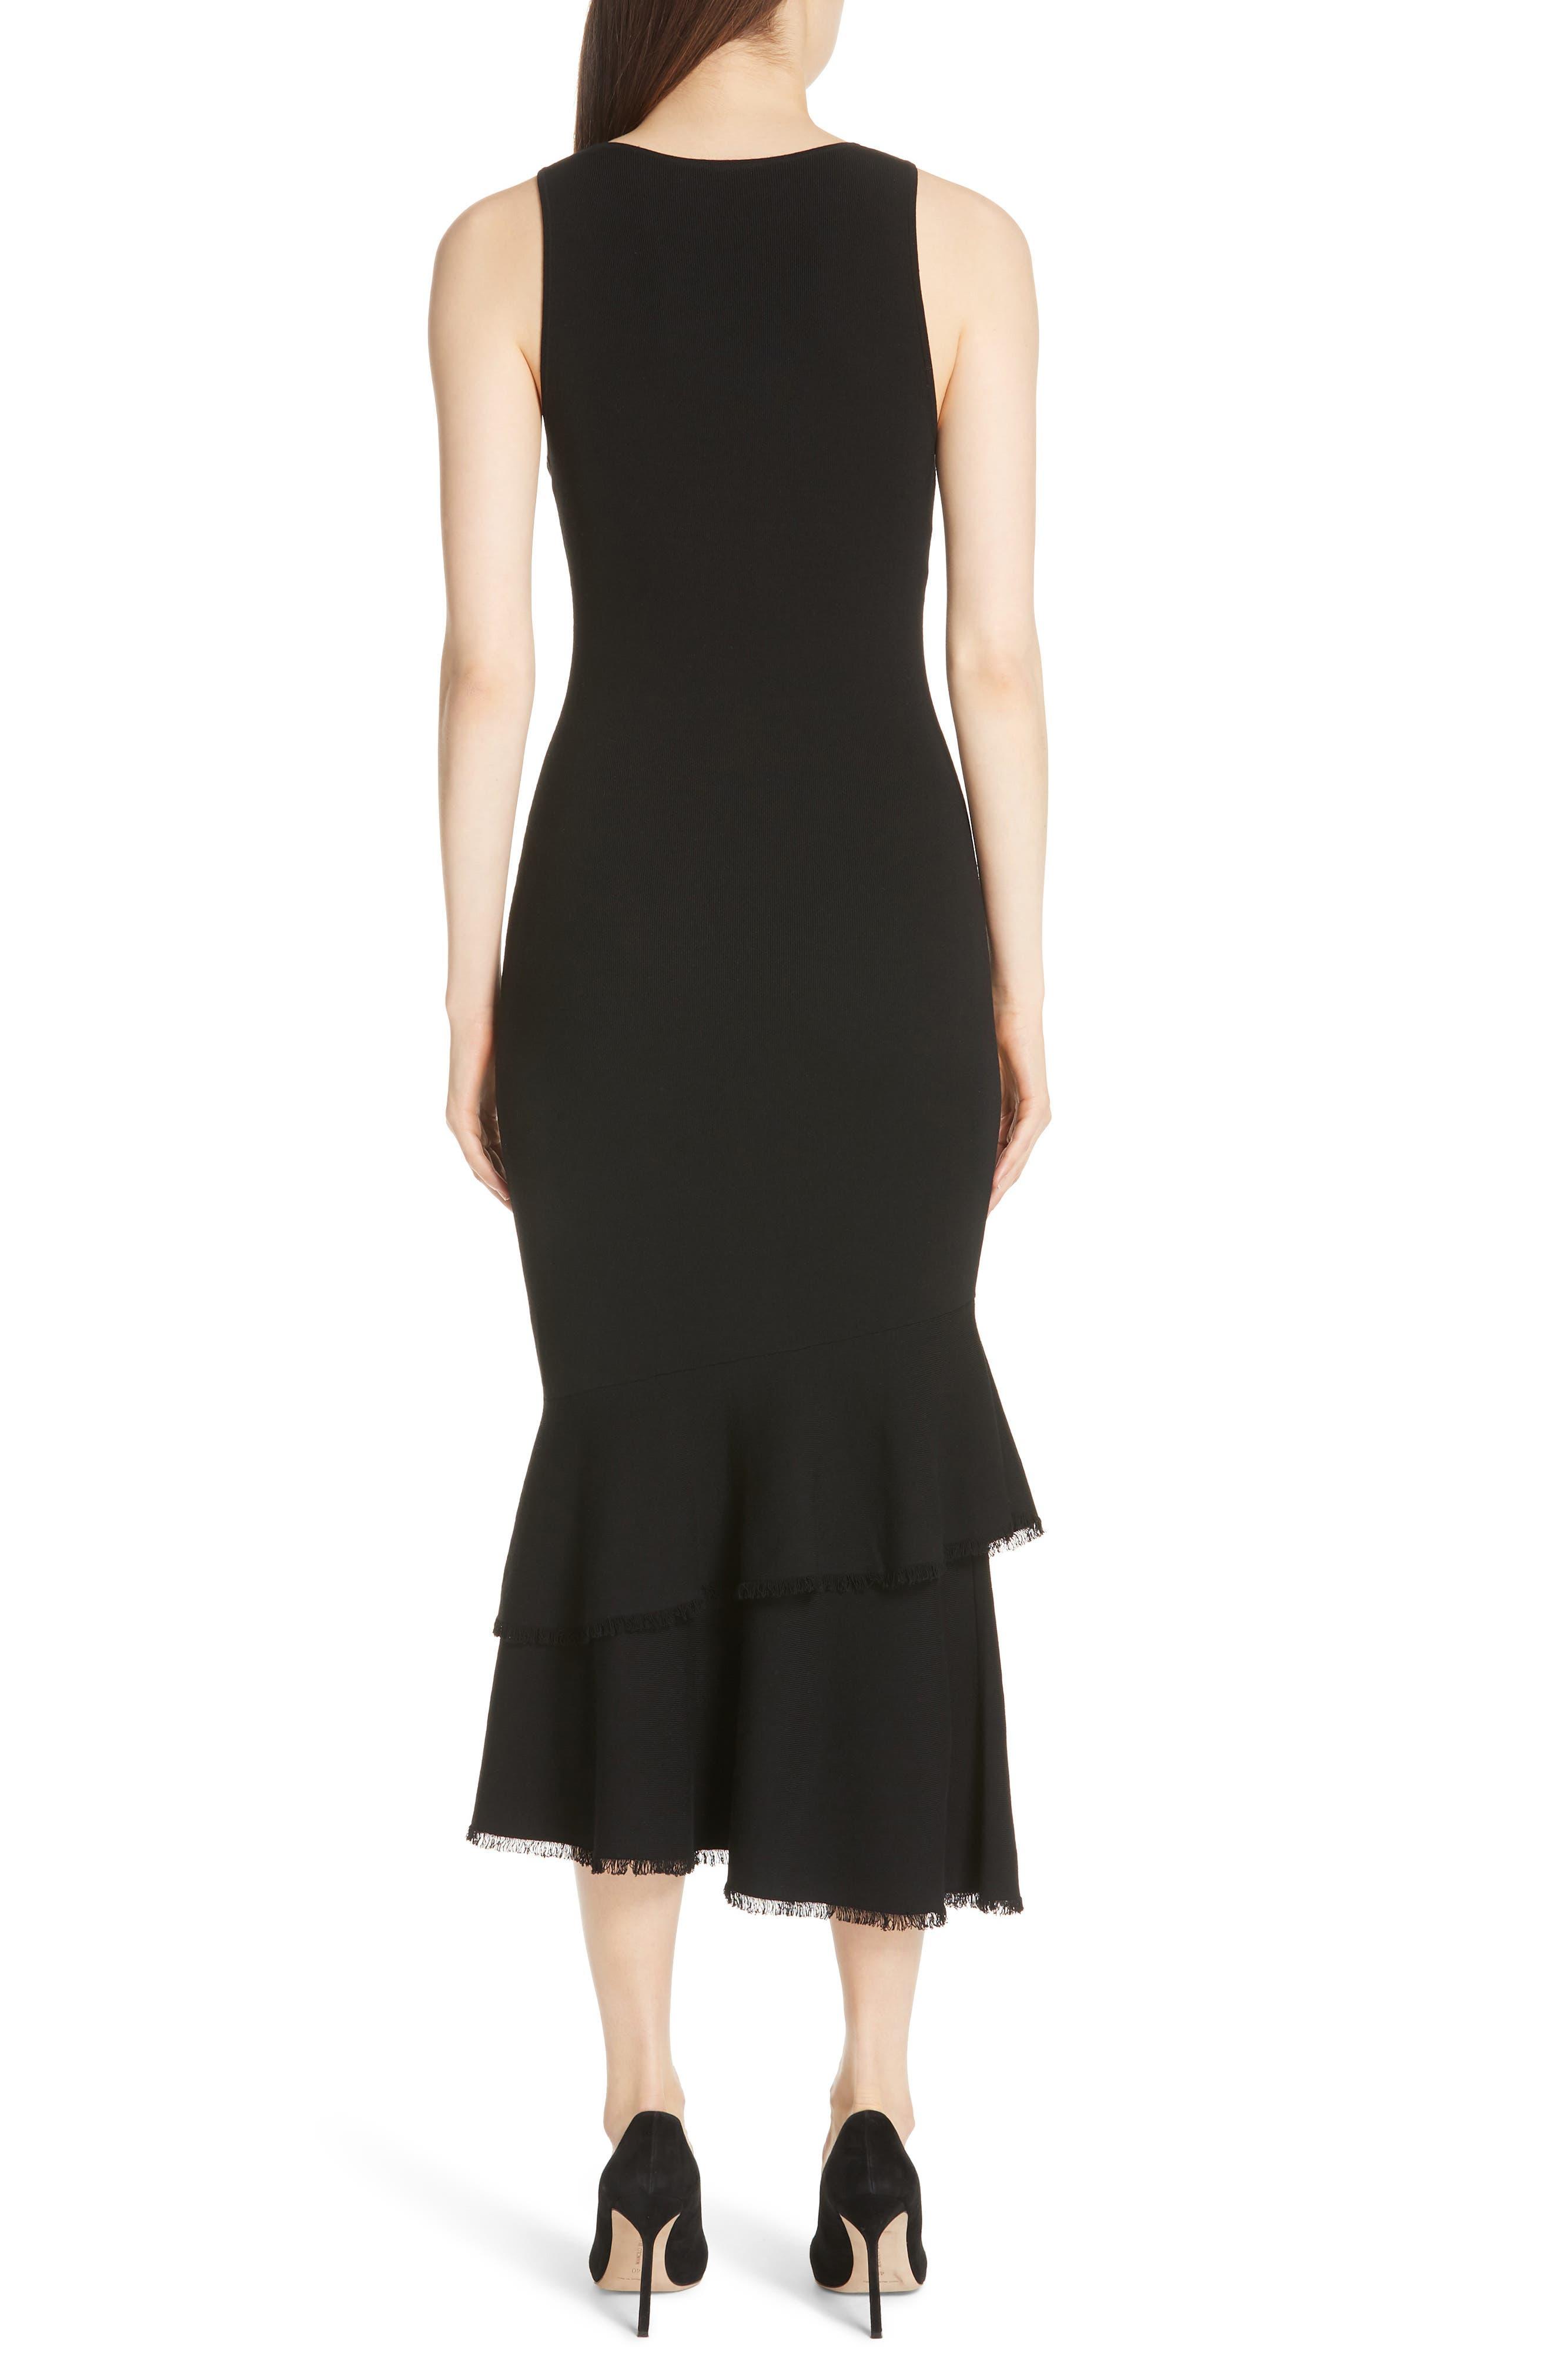 Nilimary Prosecco Midi Dress,                             Alternate thumbnail 2, color,                             Black